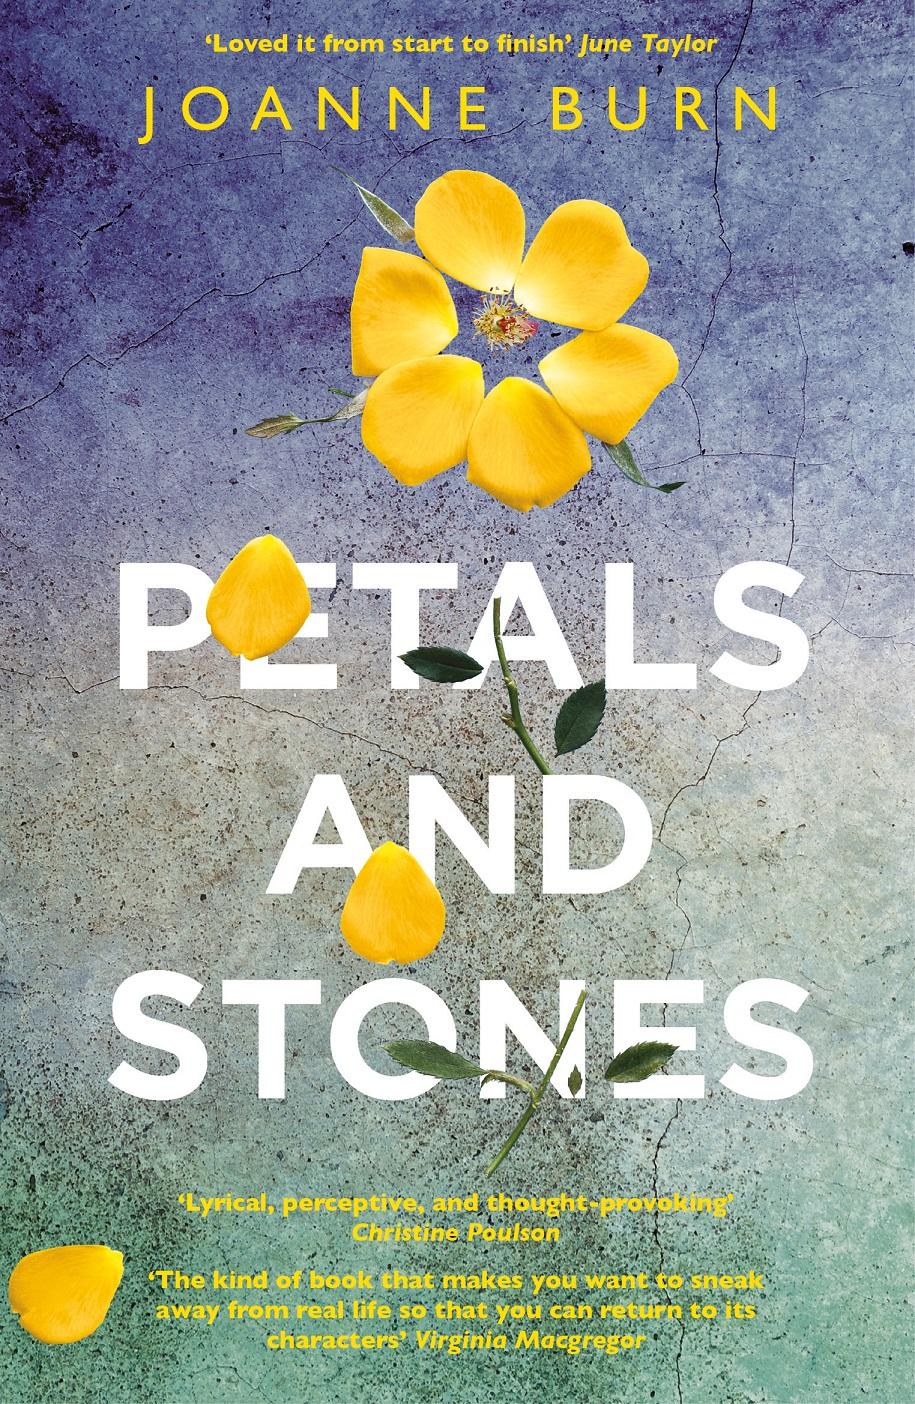 Petals-and-Stones-cover